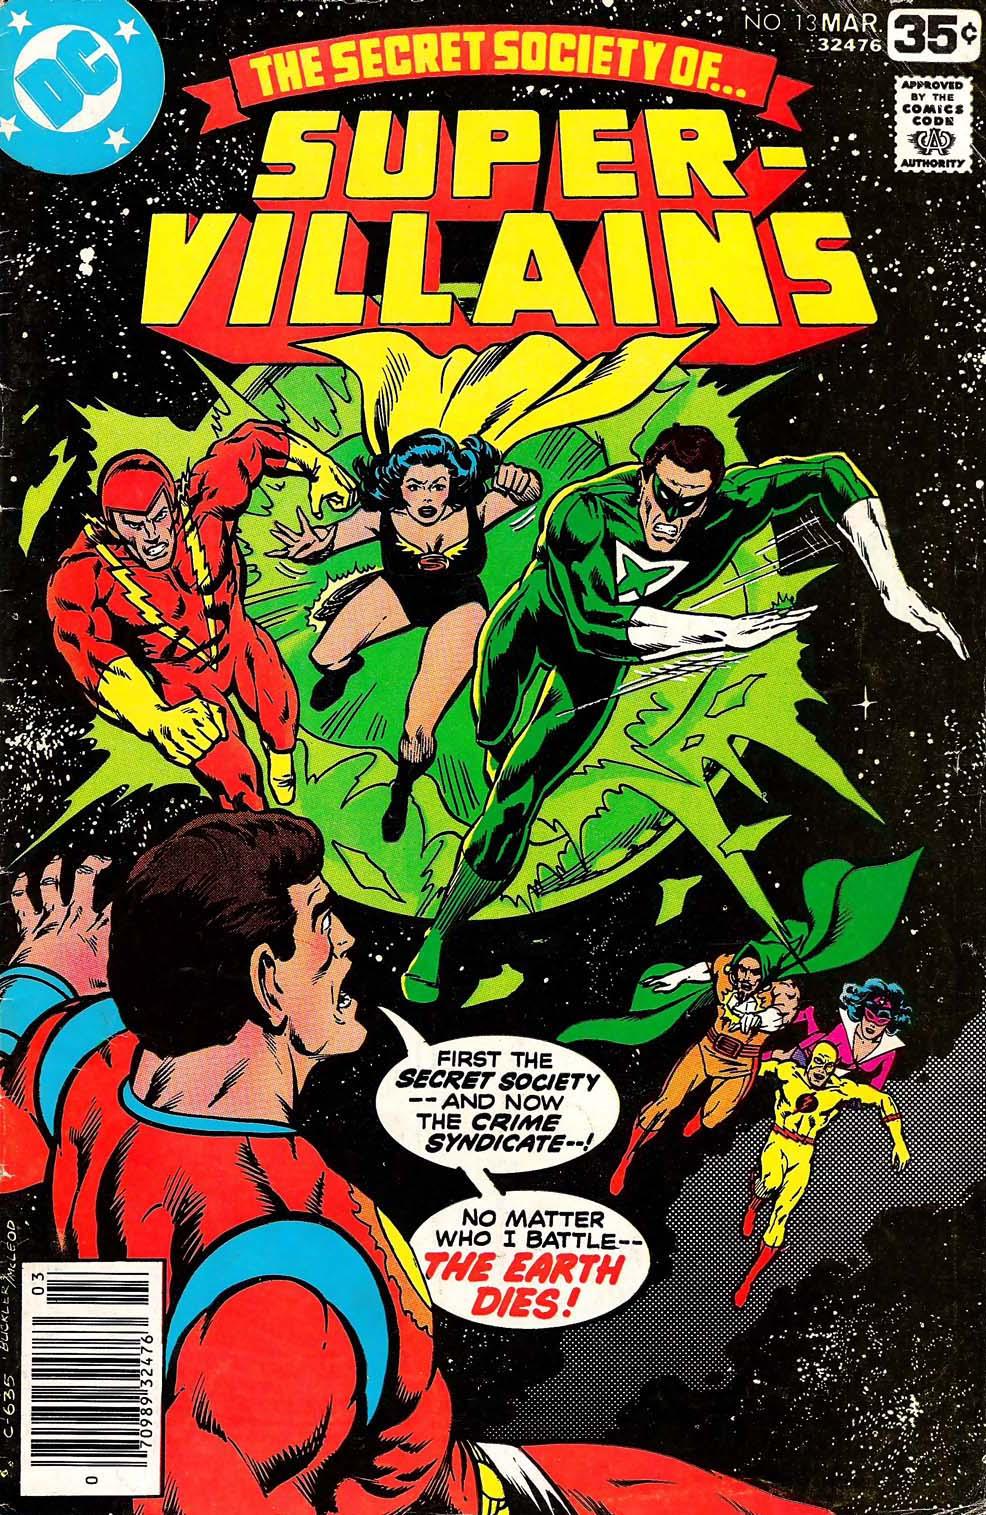 Read online Secret Society of Super-Villains comic -  Issue #13 - 1